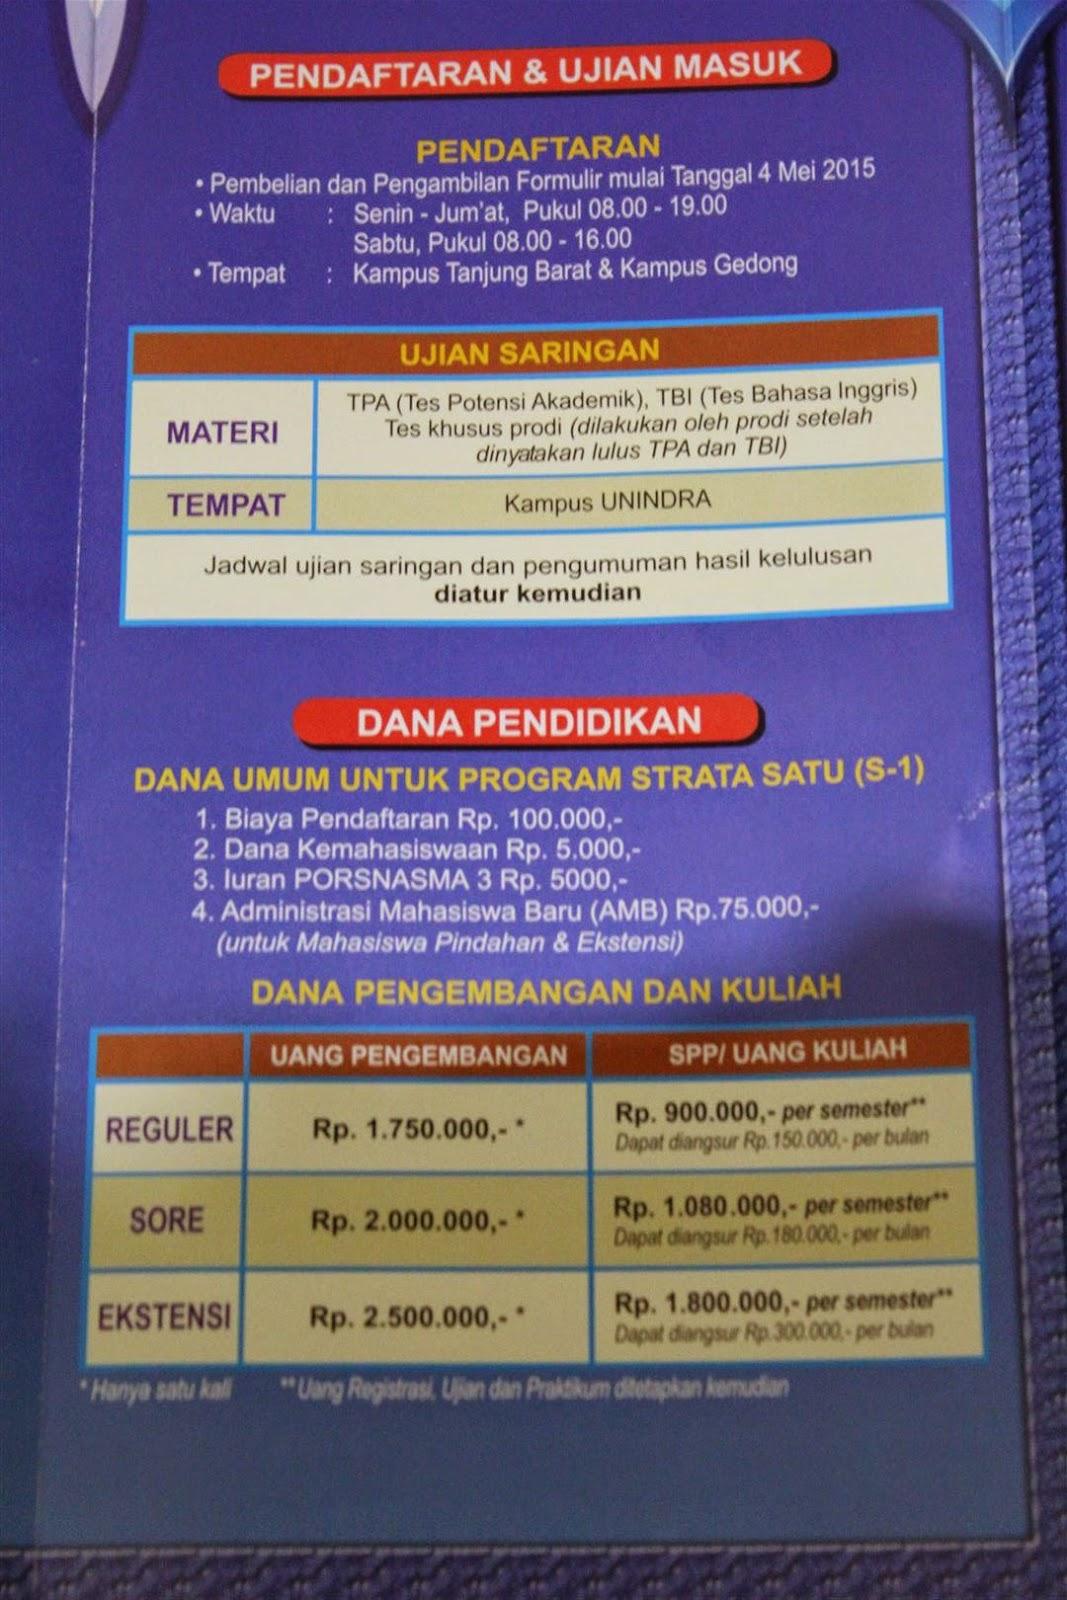 Jadwal Pendaftaran PMB UNINDRA Tahun 2015-2016